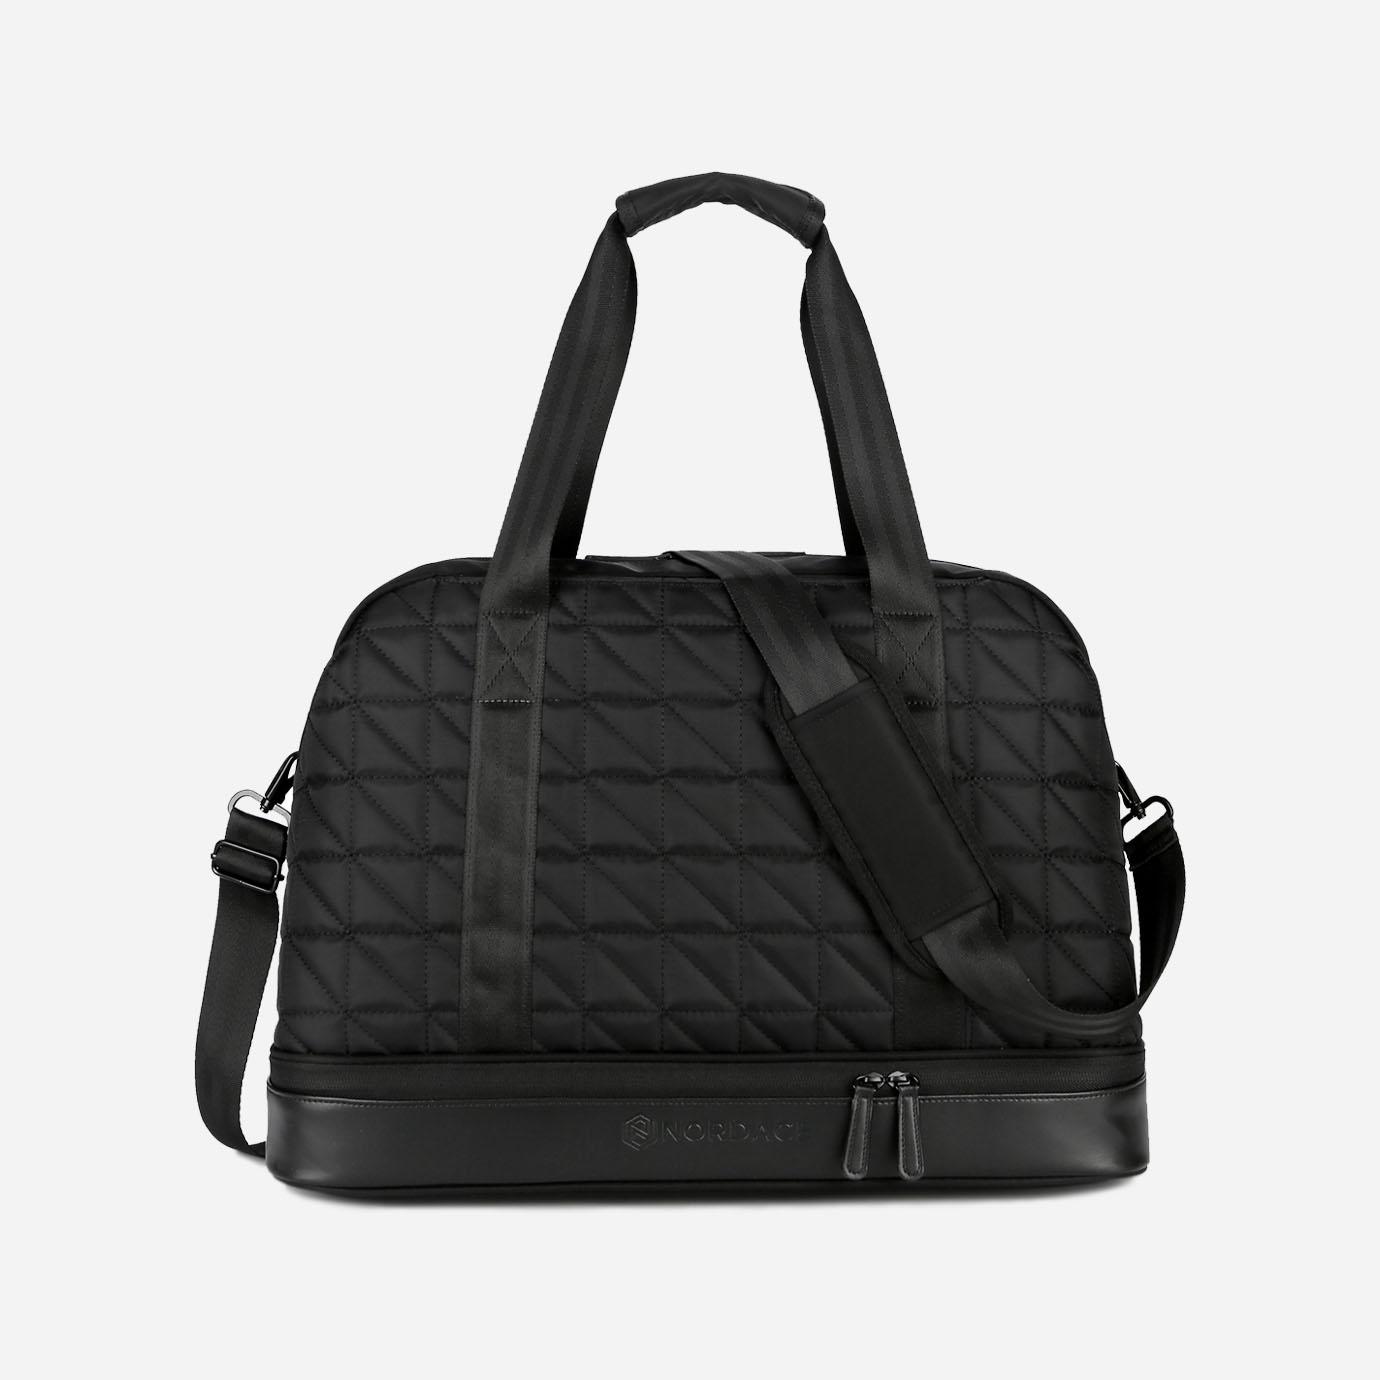 Nordace Orleans - Duffel Bag